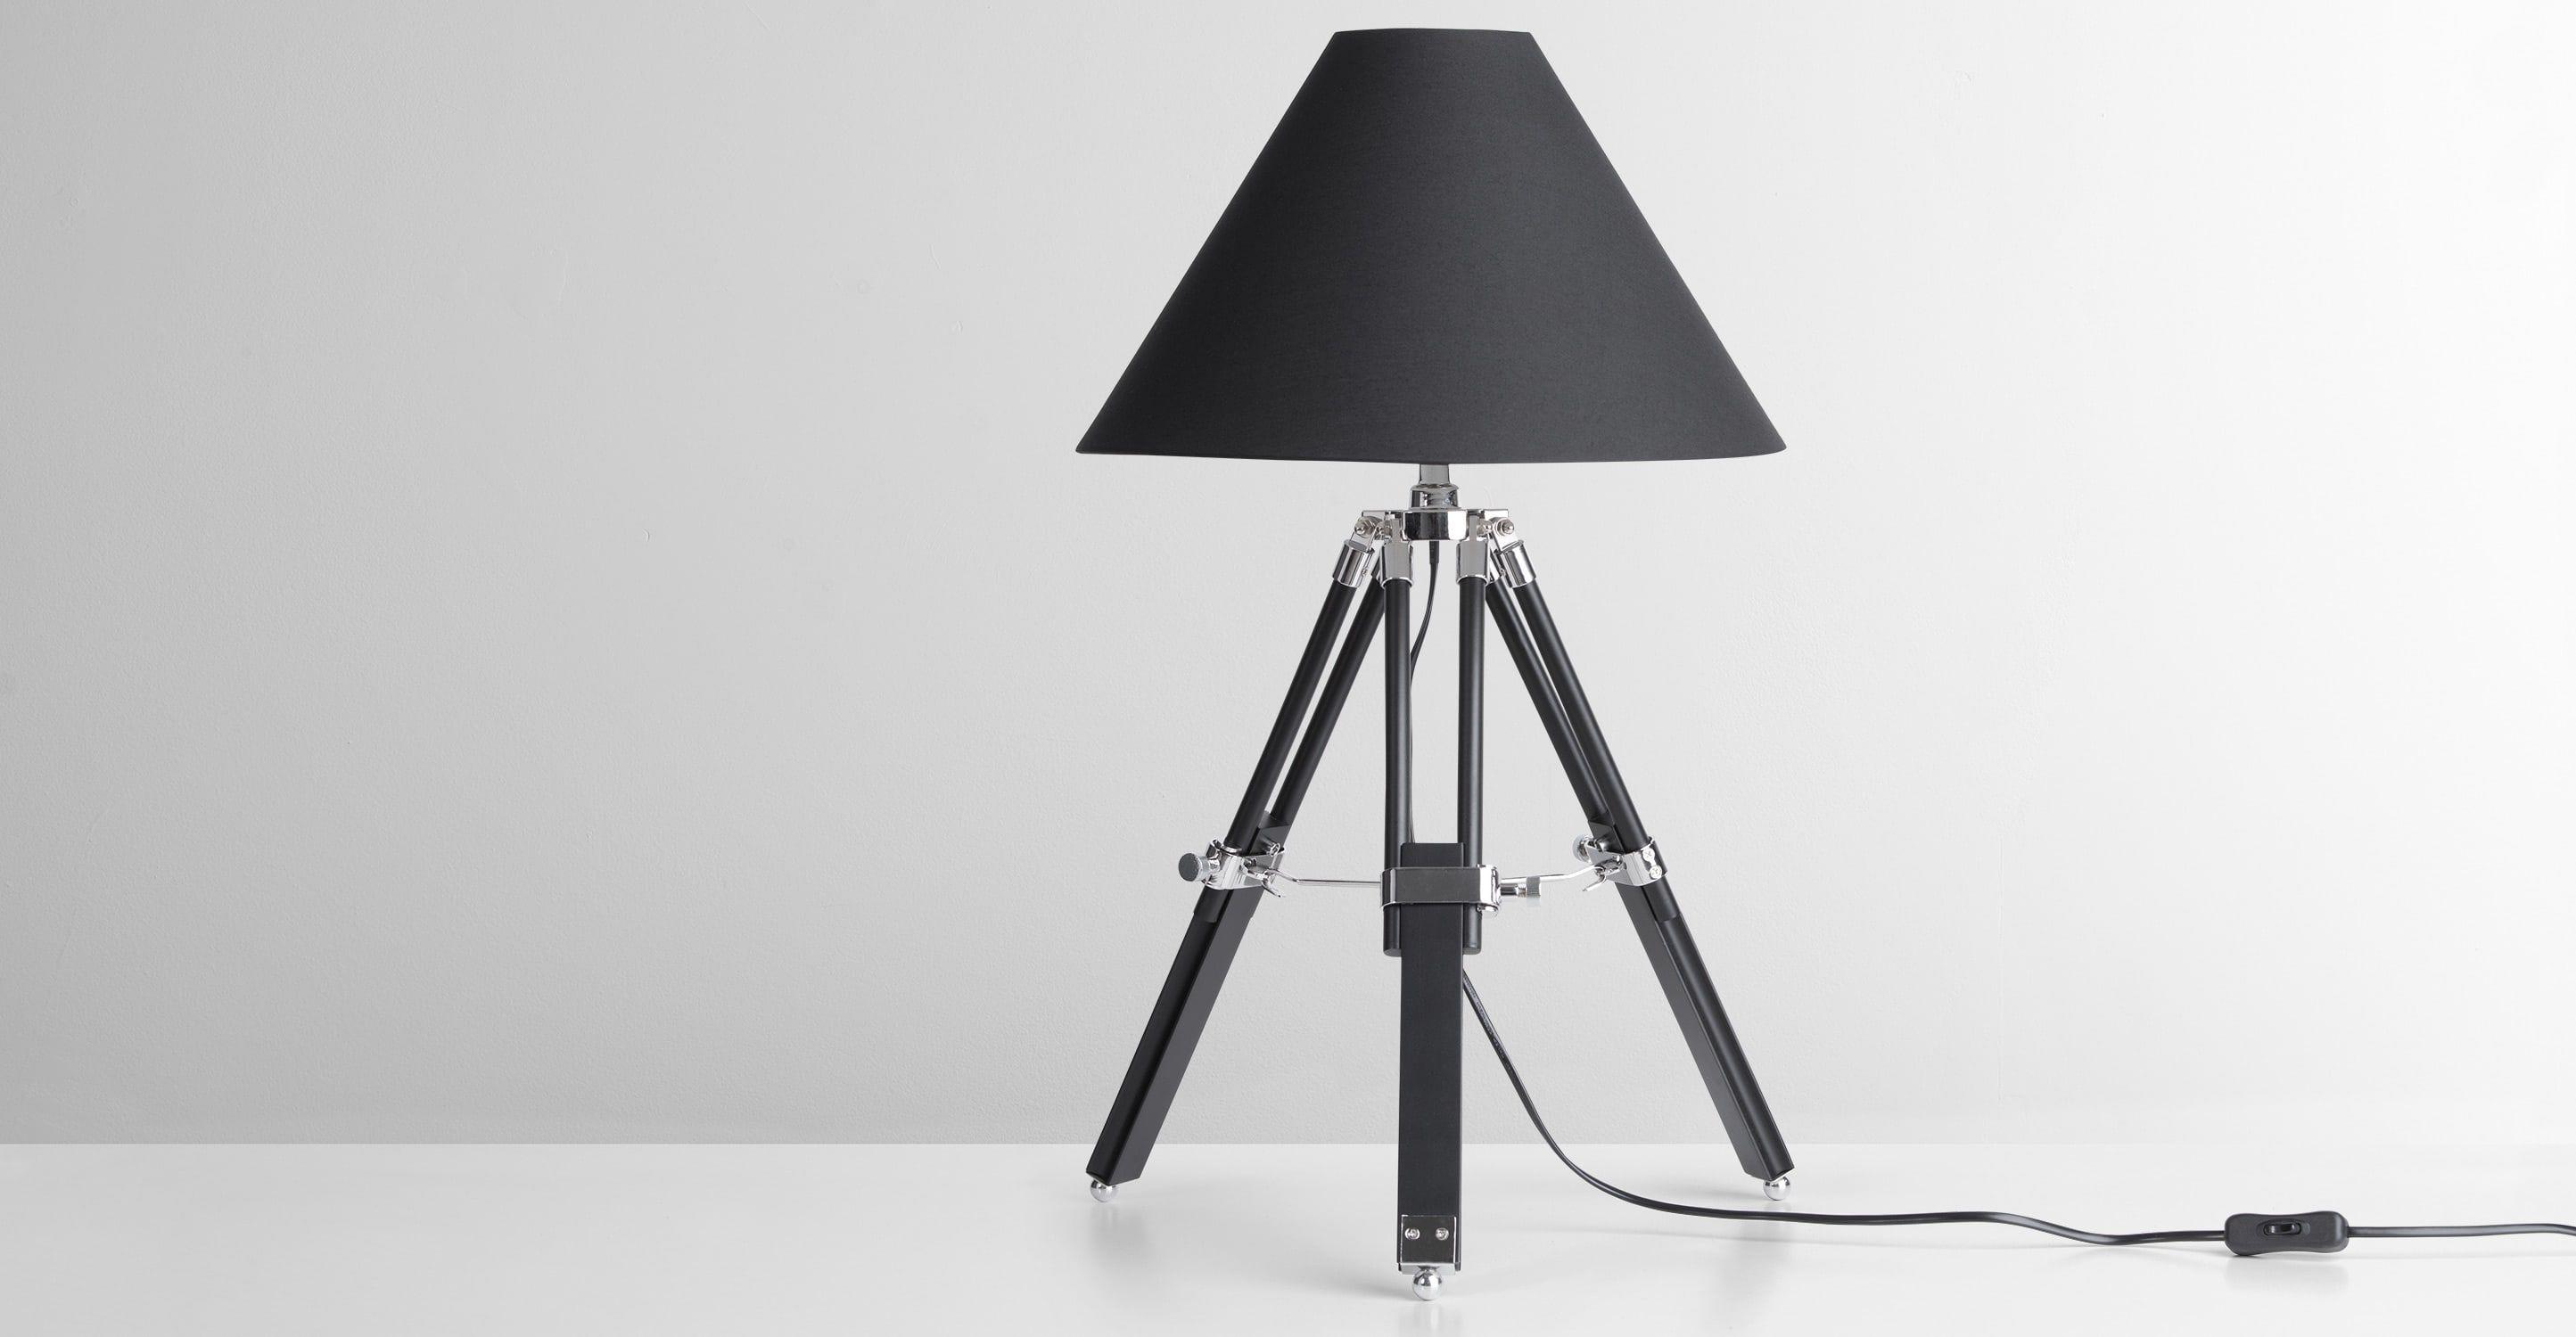 Navy tafellamp zwart zwart en lampen